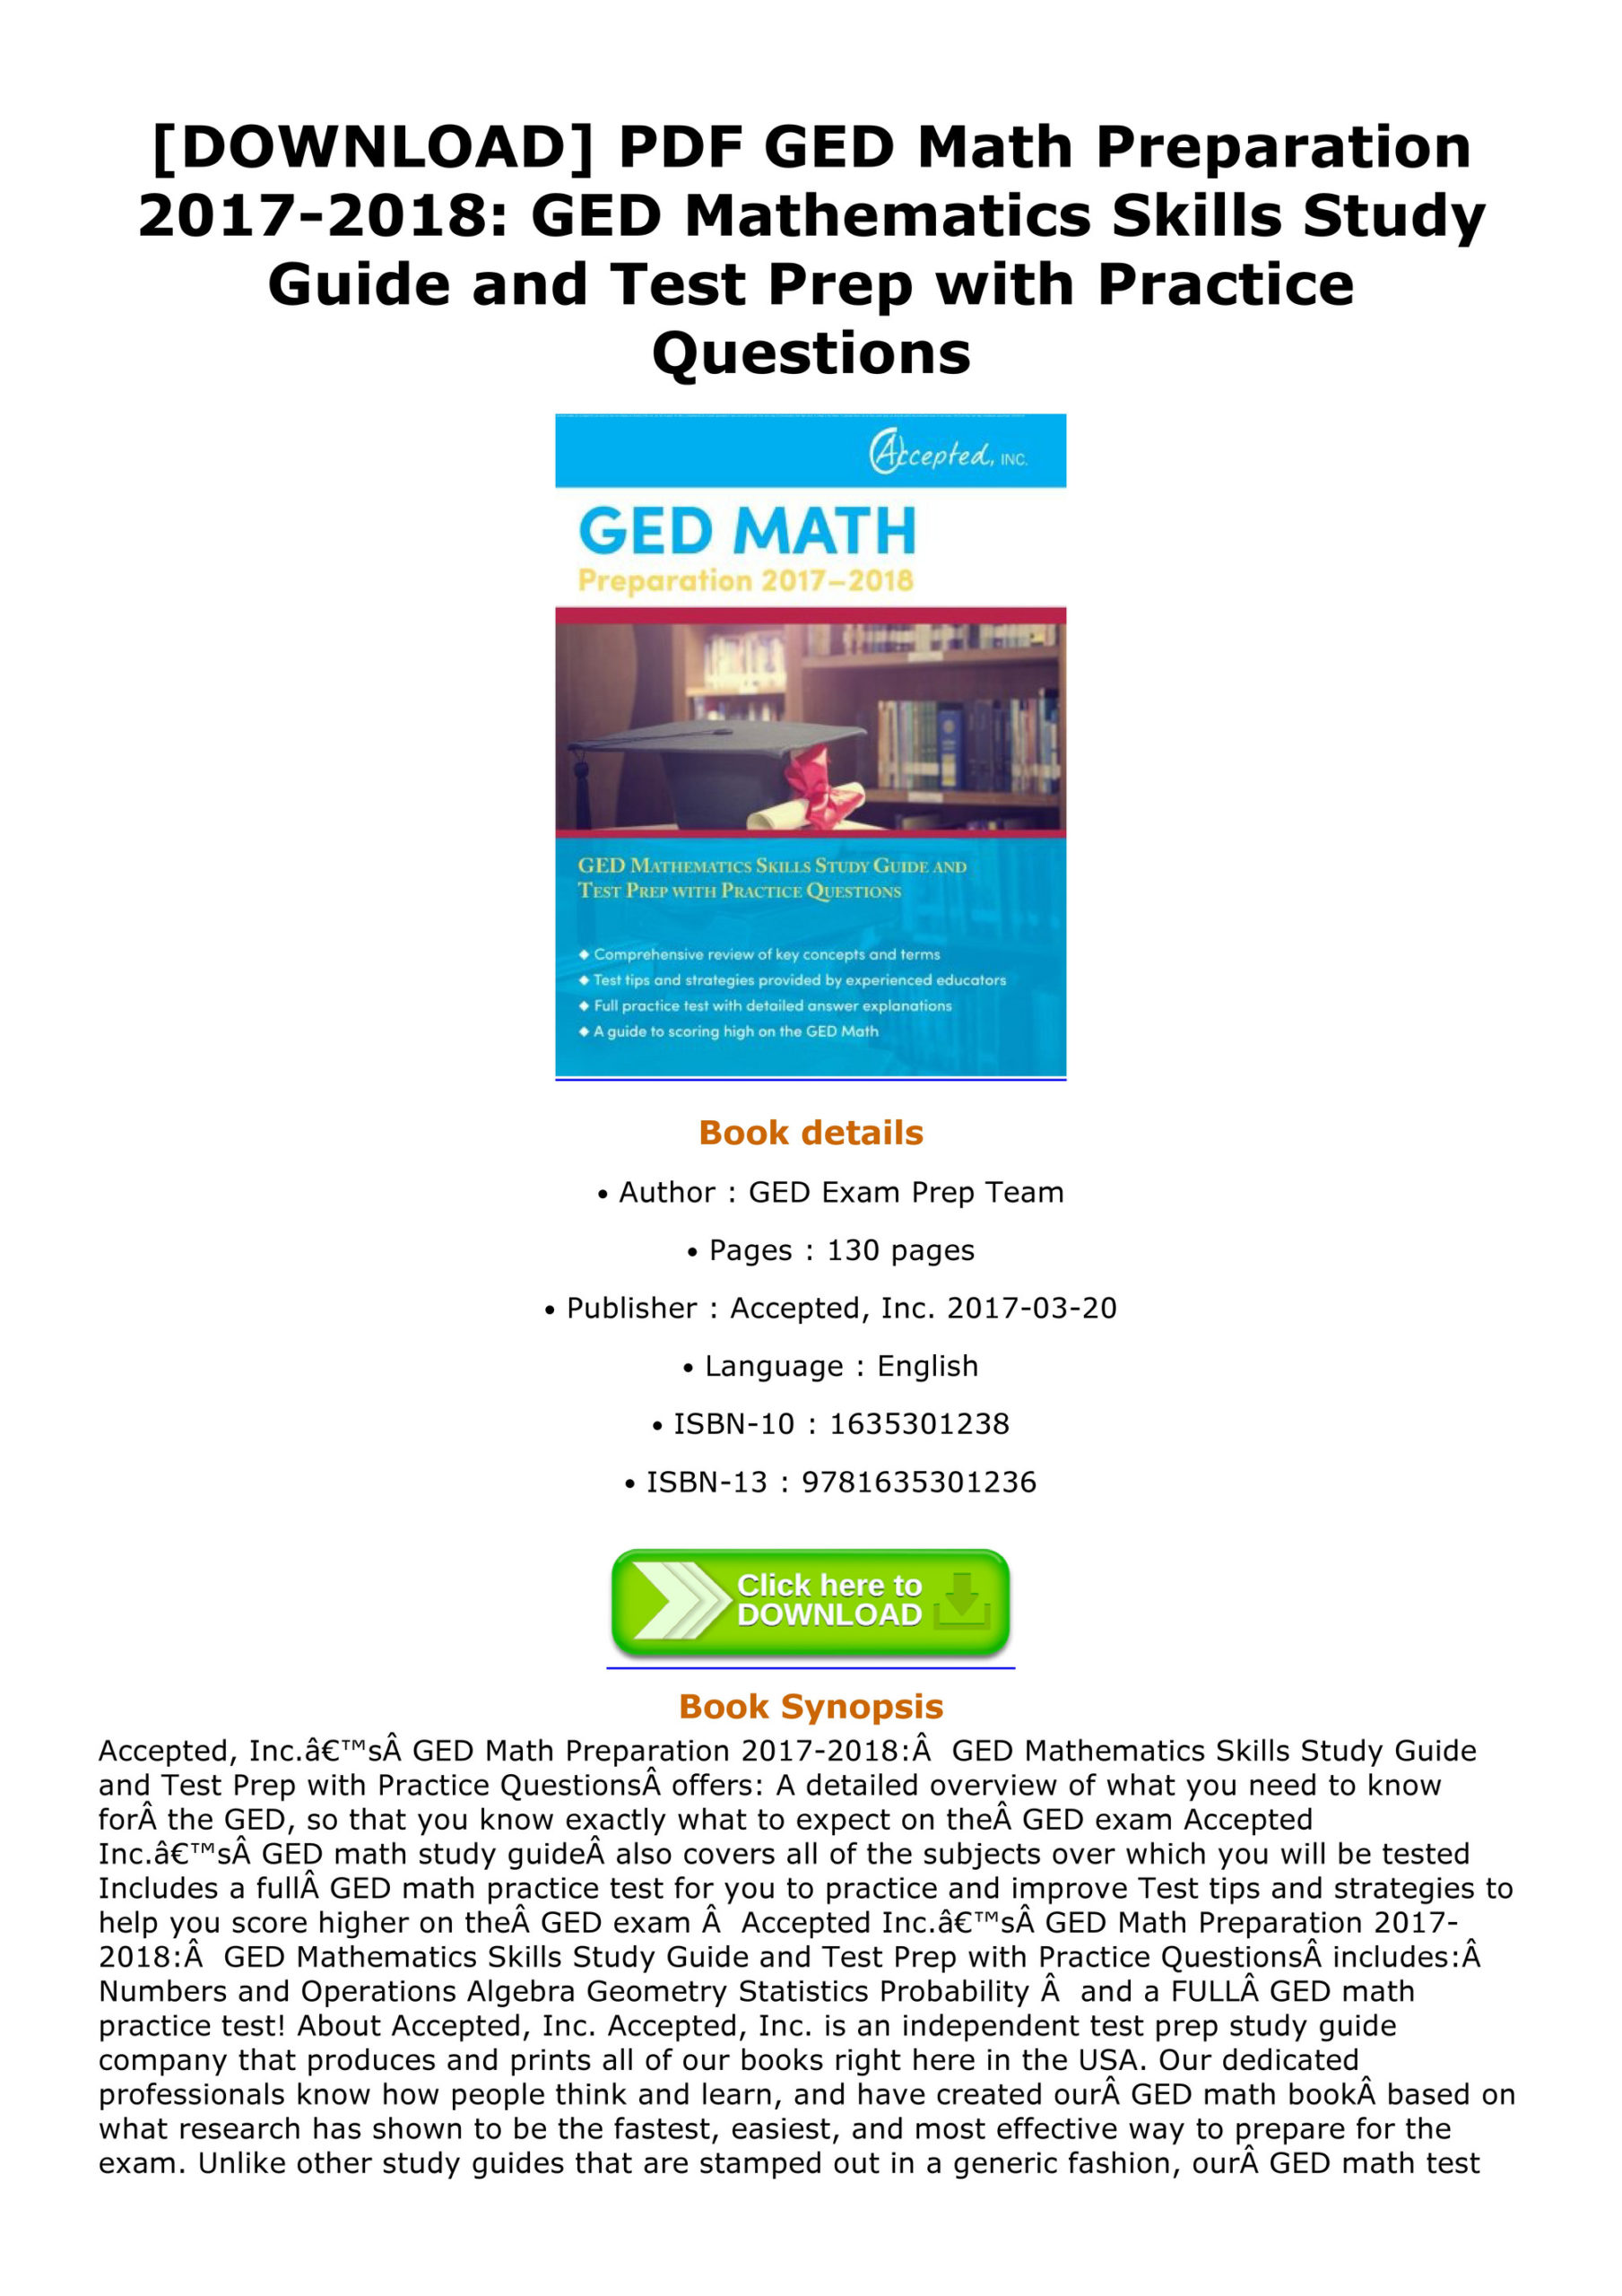 Education Book Free [Download] Odis - Download Pdf Ged Math